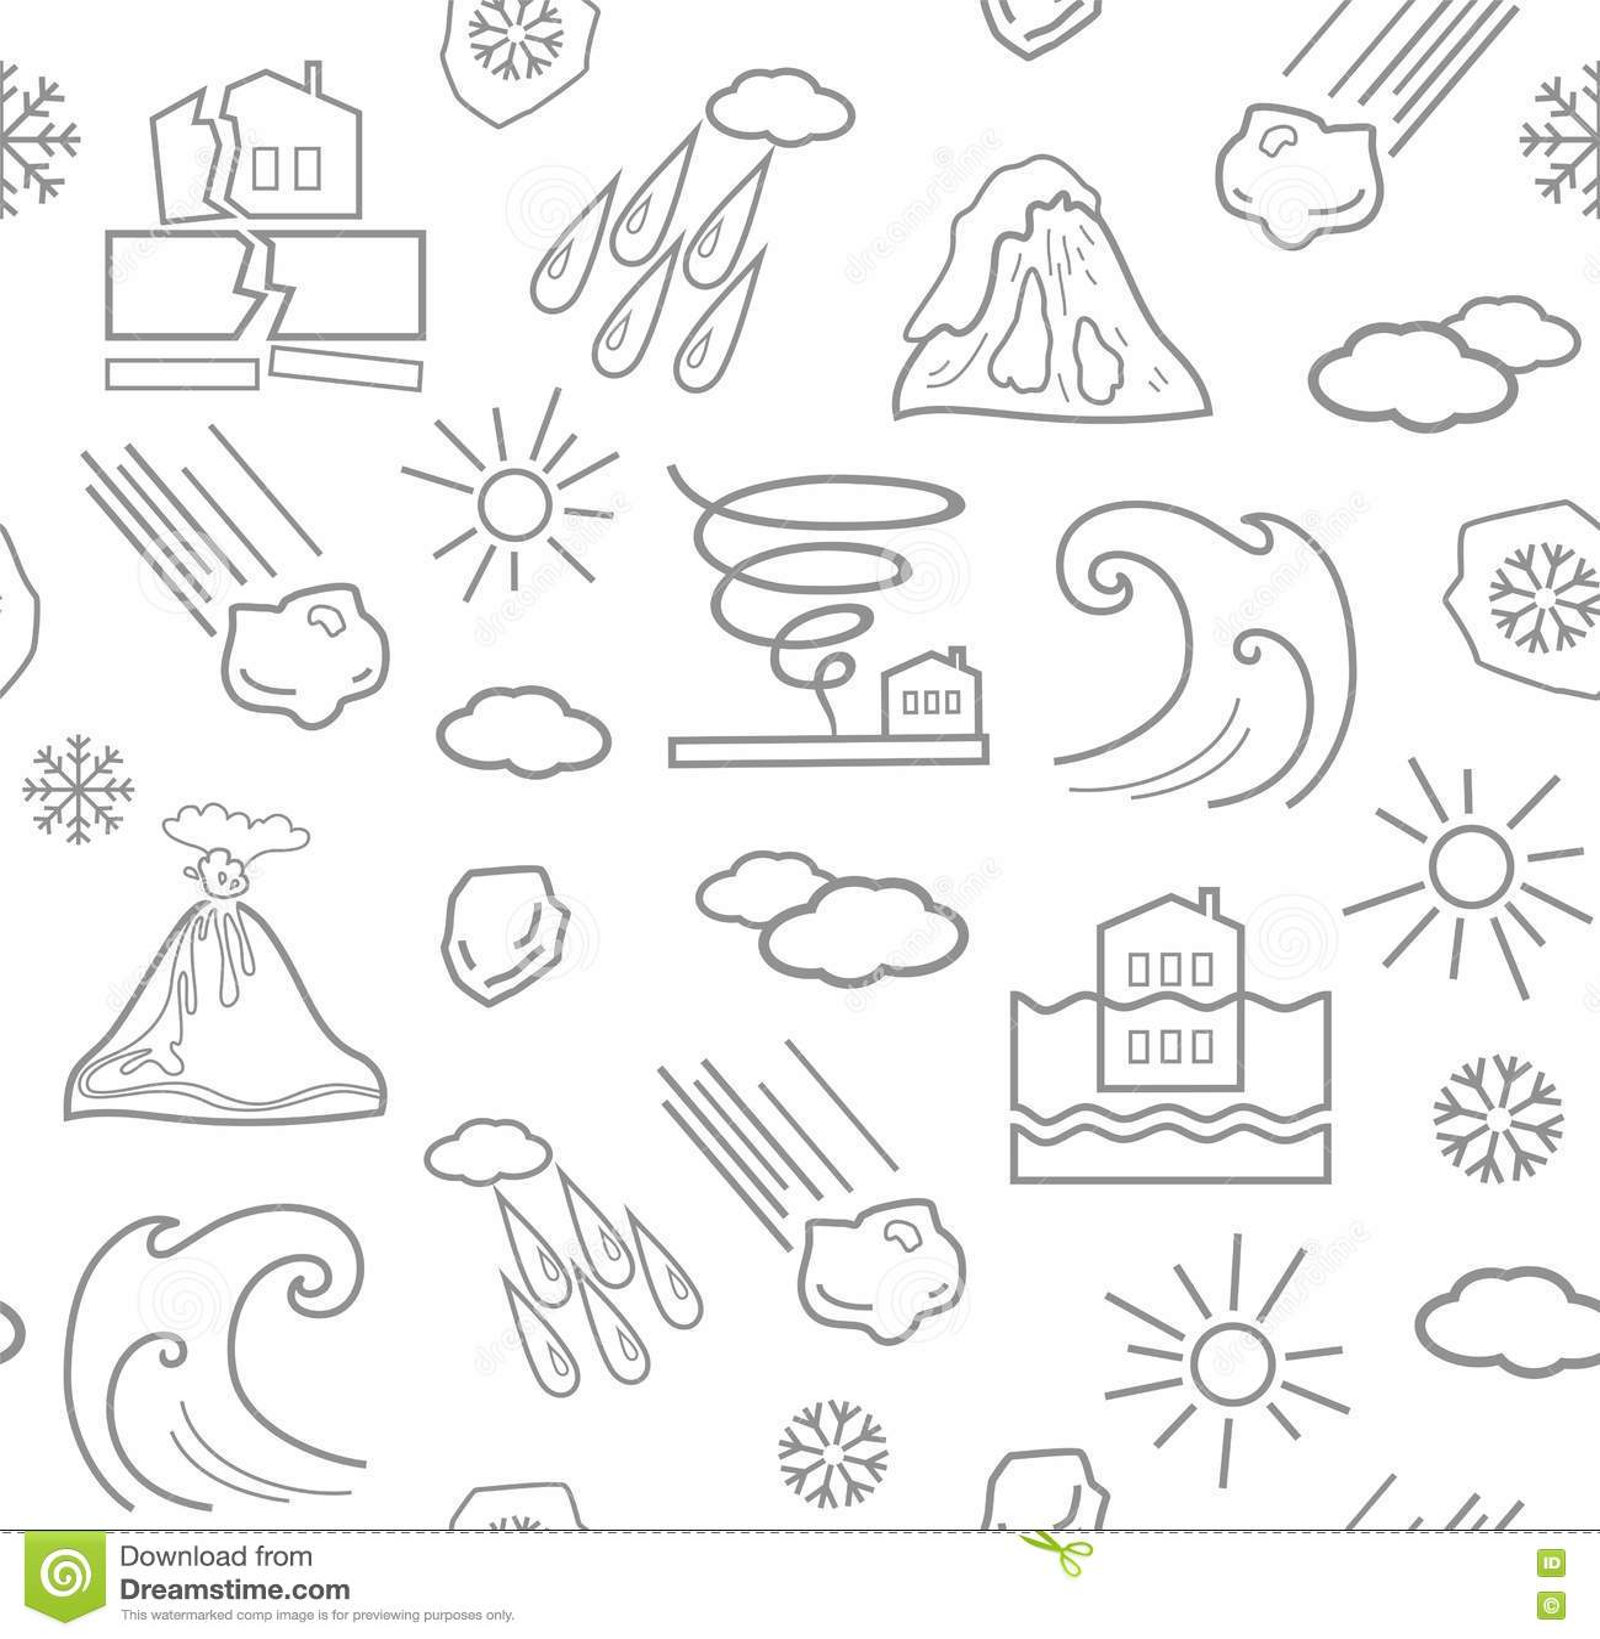 Natural Cataclysm Icons Set, Flat Style Cartoon Vector